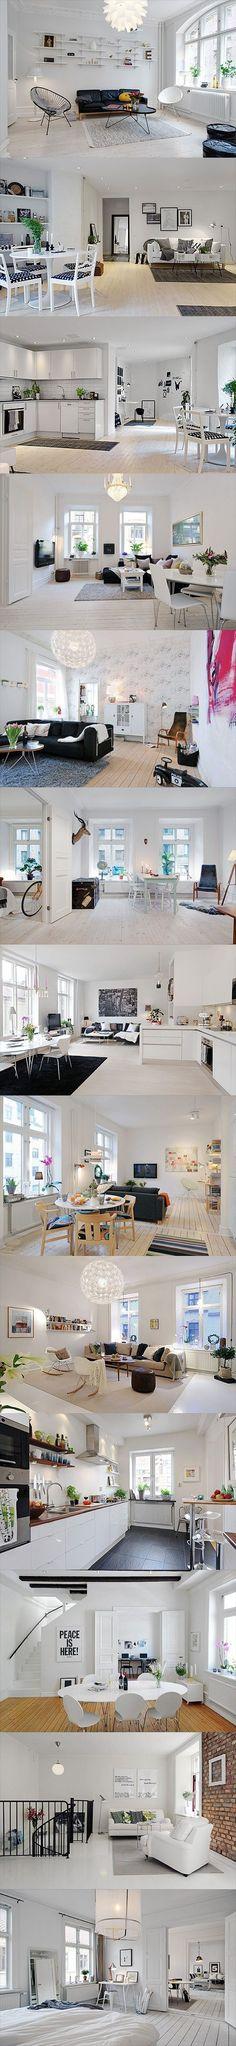 Beautiful & Stylish Scandinavian interior design inspiration | http://roomdesign14.blogspot.com